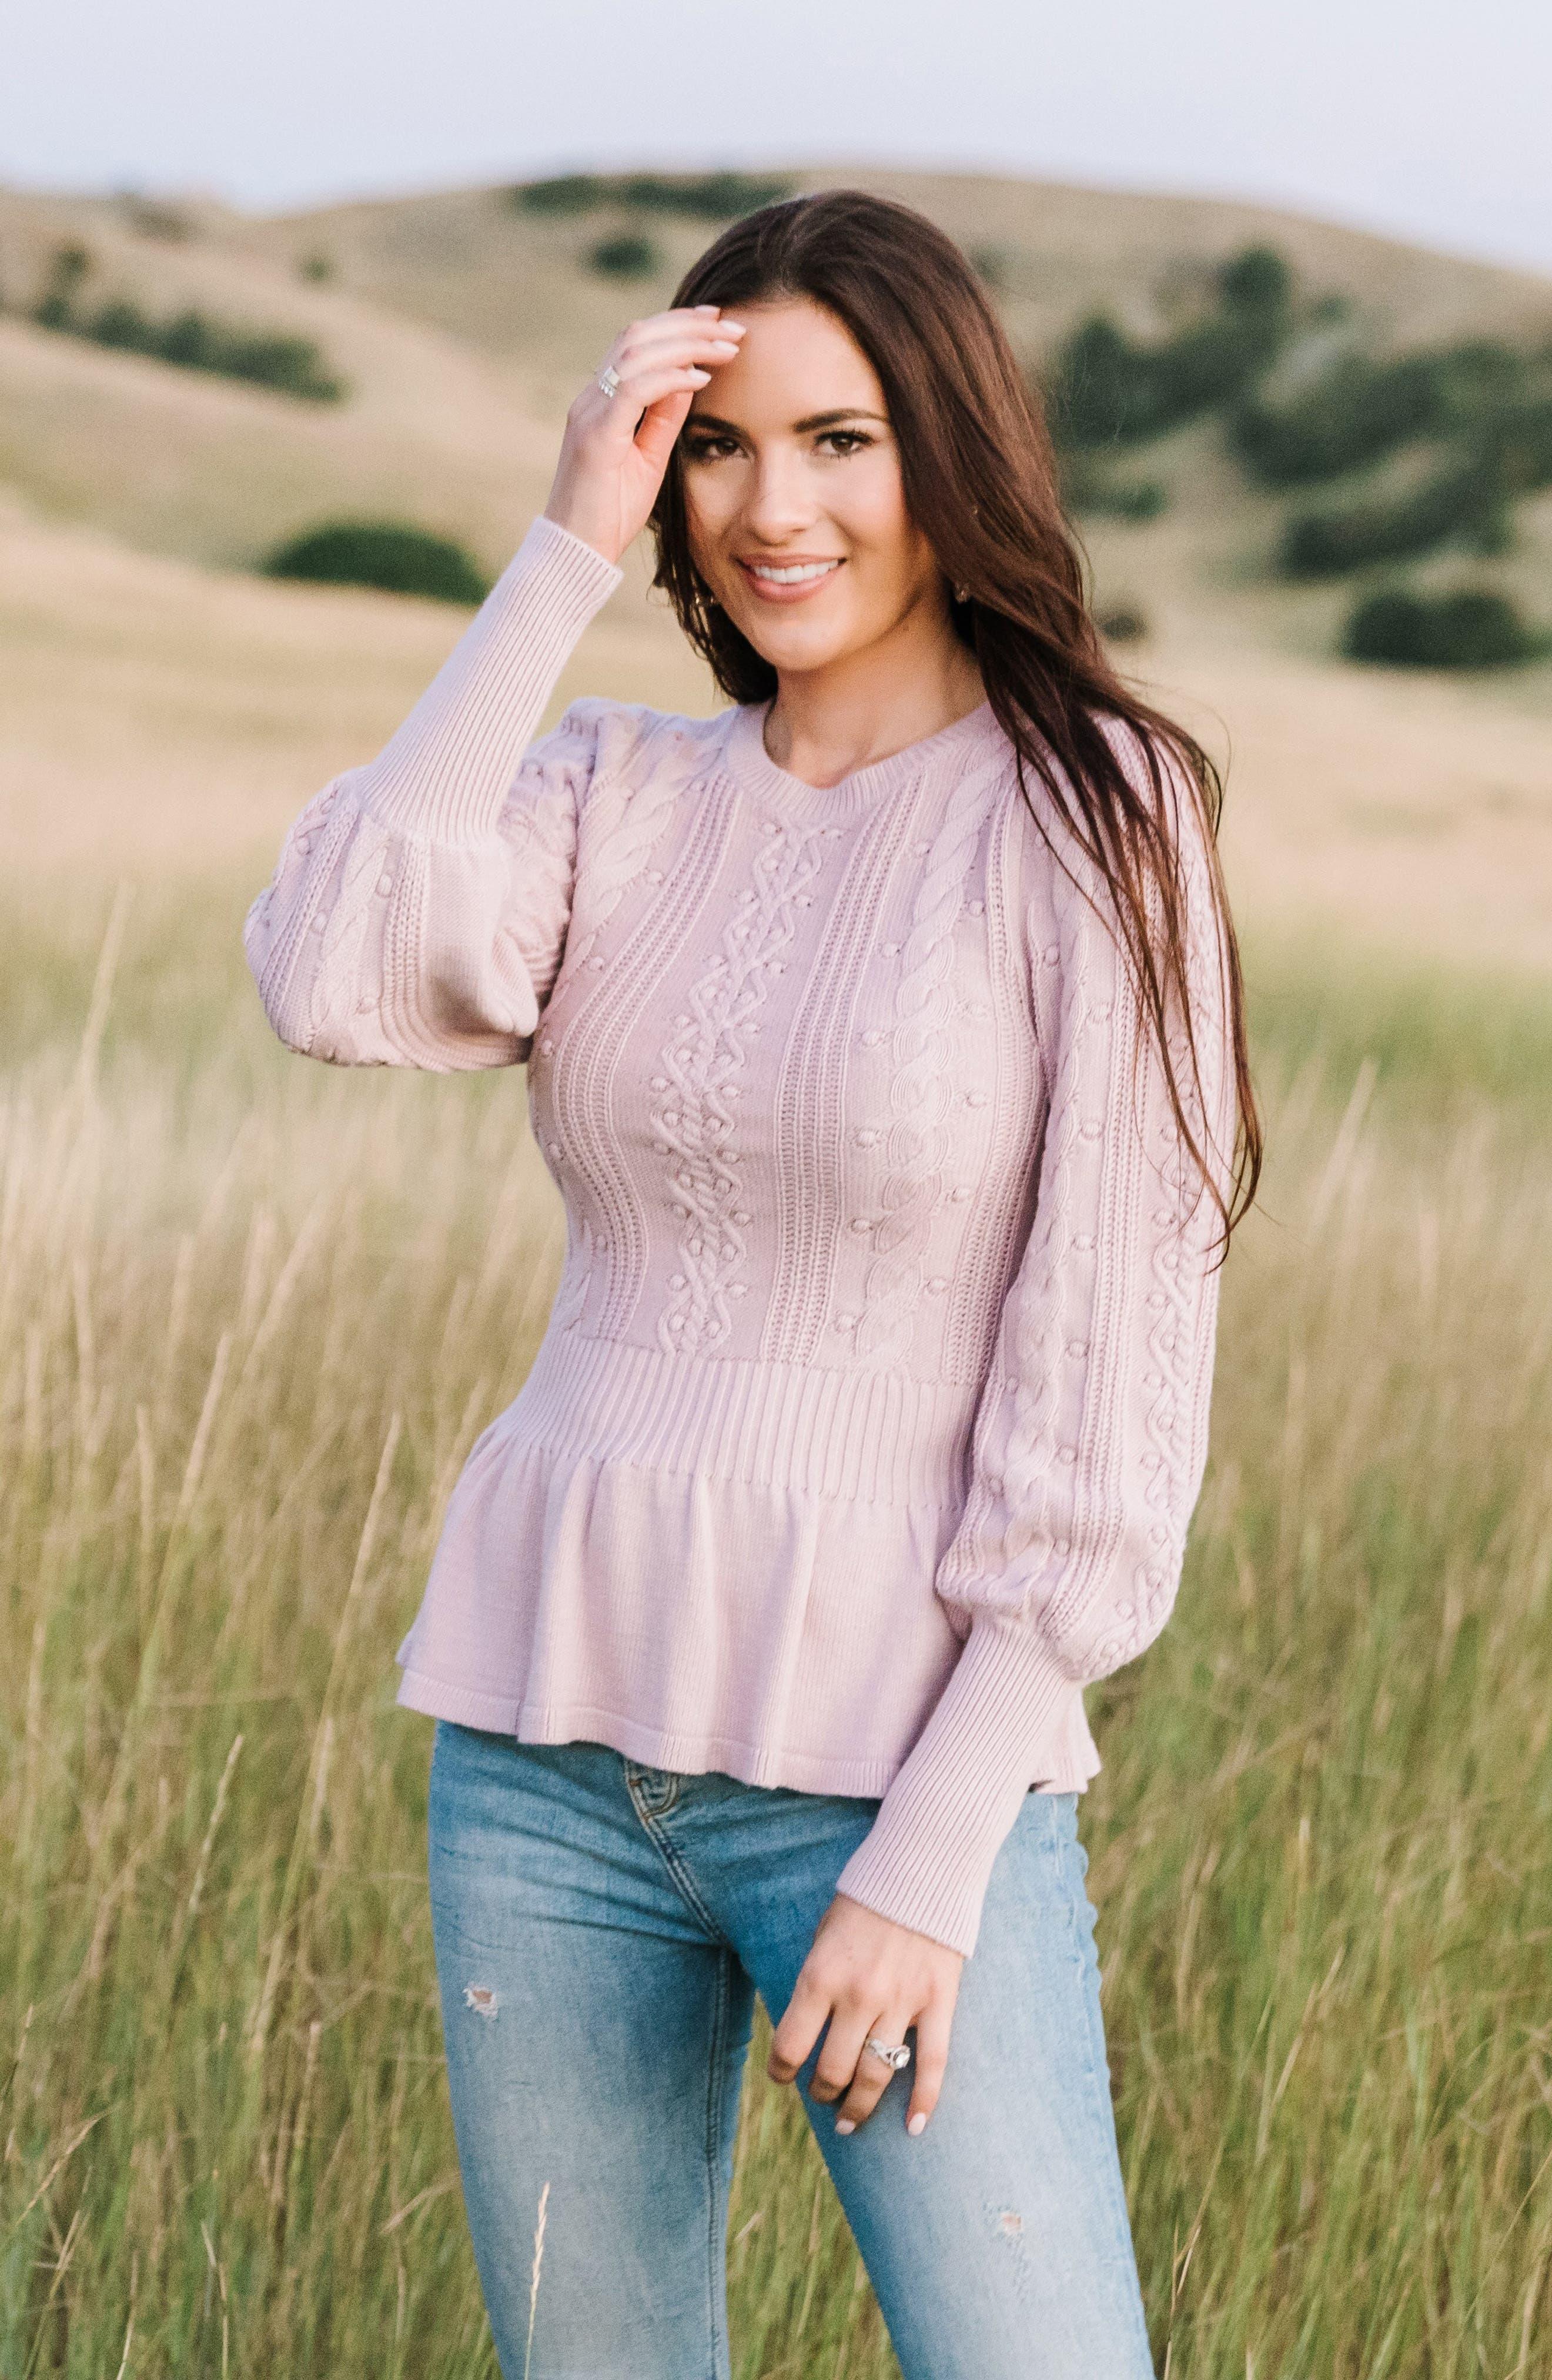 Edwardian Blouses   White & Black Lace Blouses & Sweaters Womens Rachel Parcell Cable Bobble Peplum Cotton Blend Sweater Size Small - Pink Nordstrom Exclusive $85.00 AT vintagedancer.com